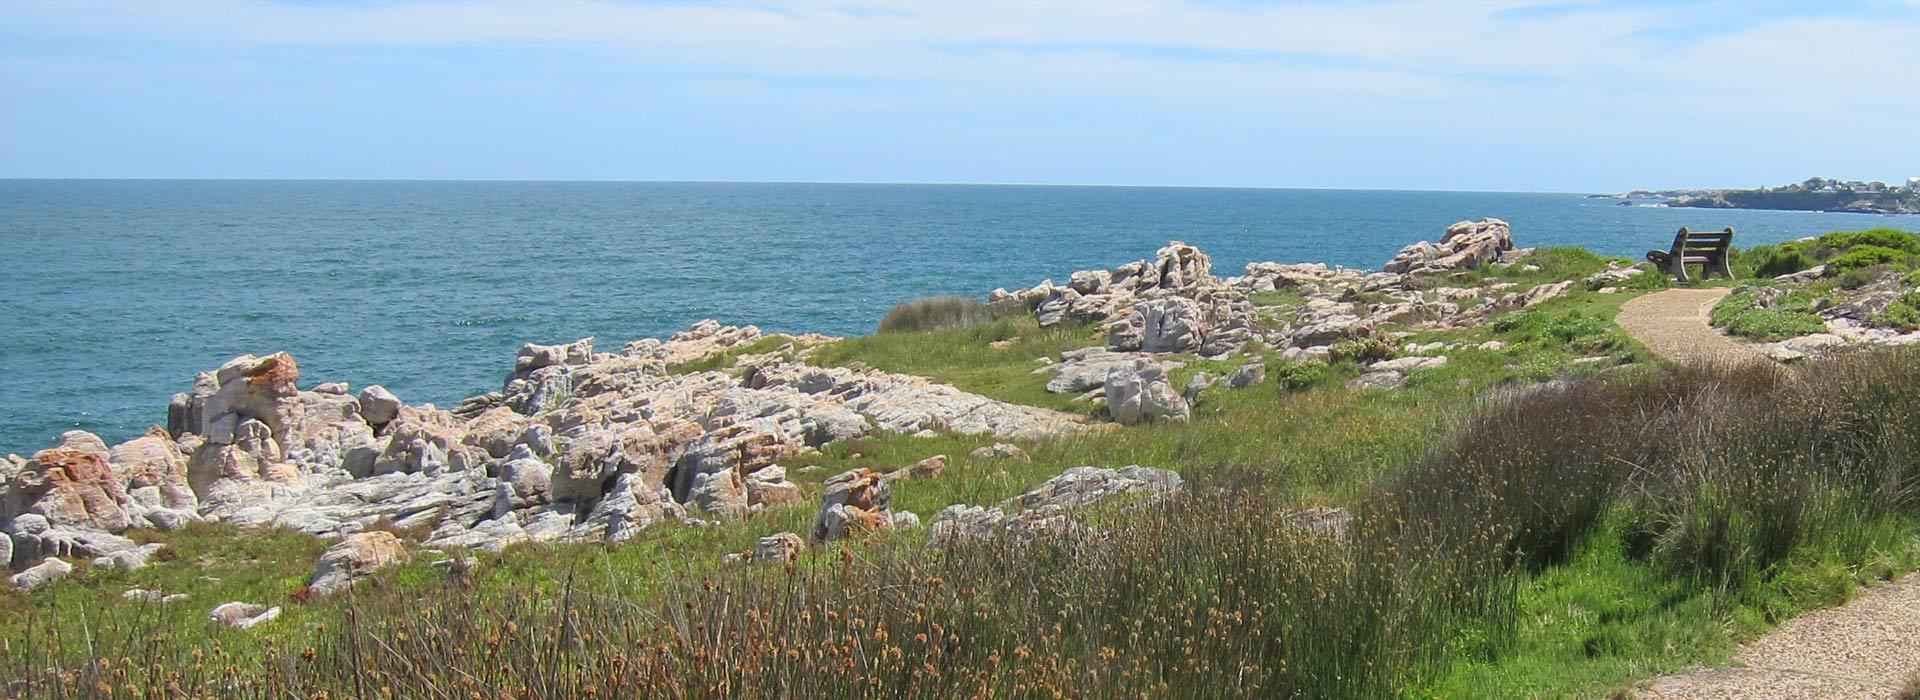 The famous Hermanus Cliff Path